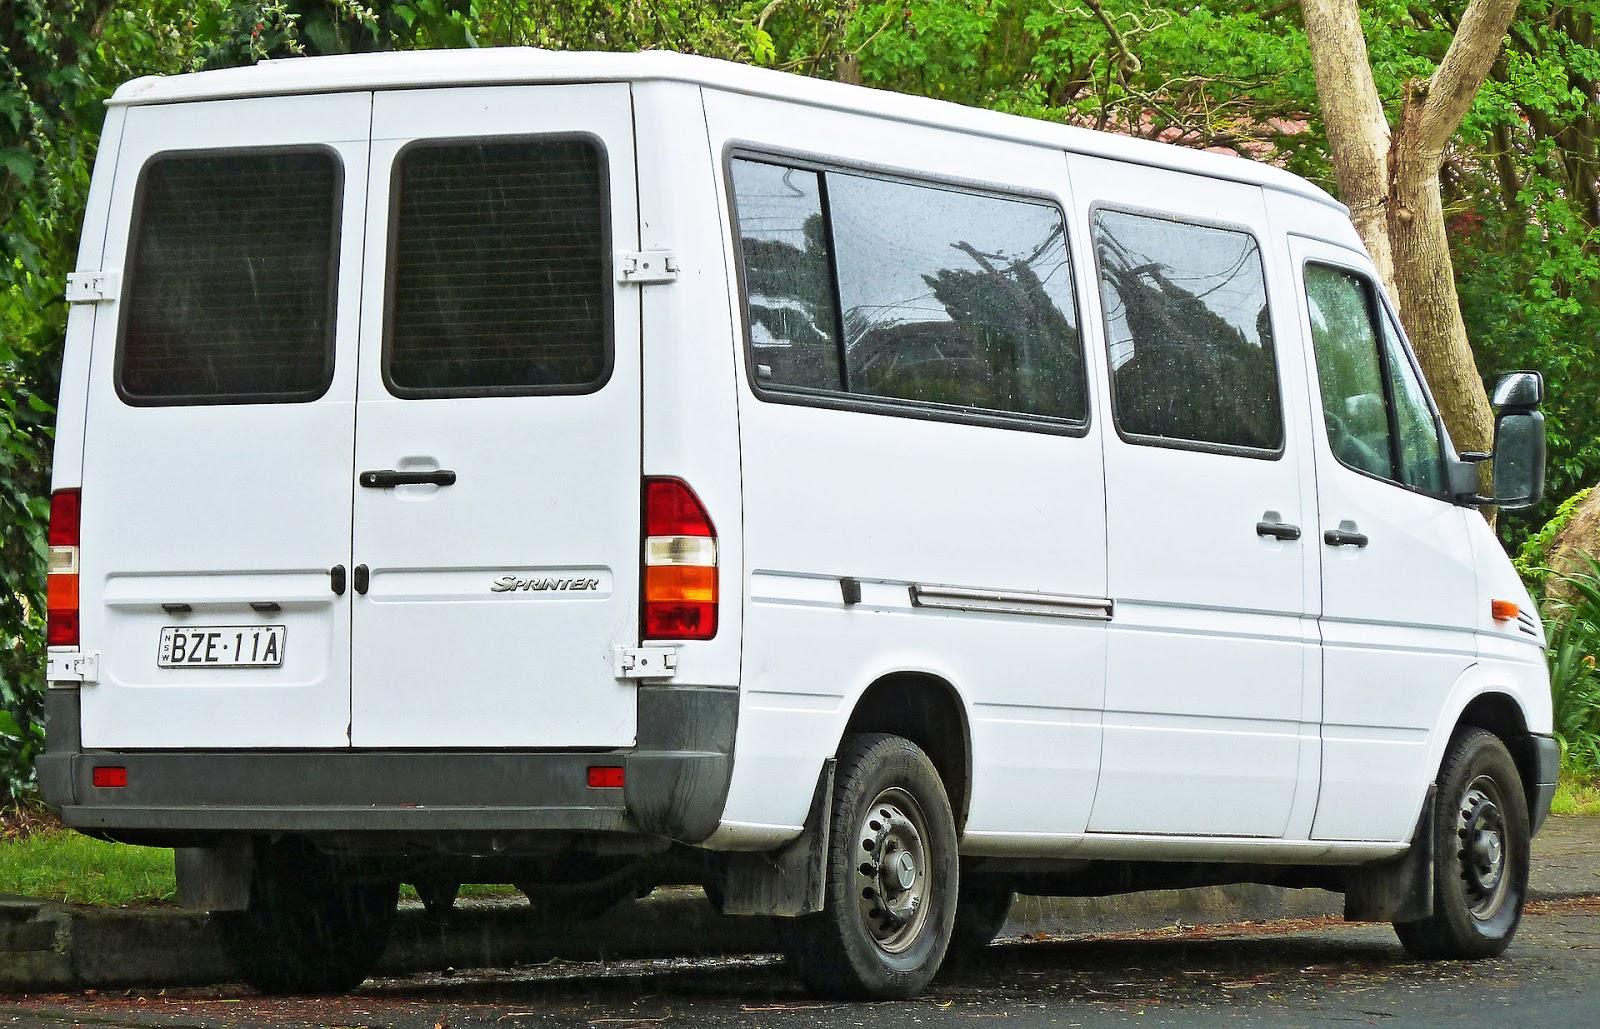 2007–2010 & 2012–present (Argentina) Powertrain: 2.1 L inline 4 OM 646 CDI  3.0L V6 OM642 CDI 3.5L V6 M272 Transmission: 6 speed manual 5 speed  automatic